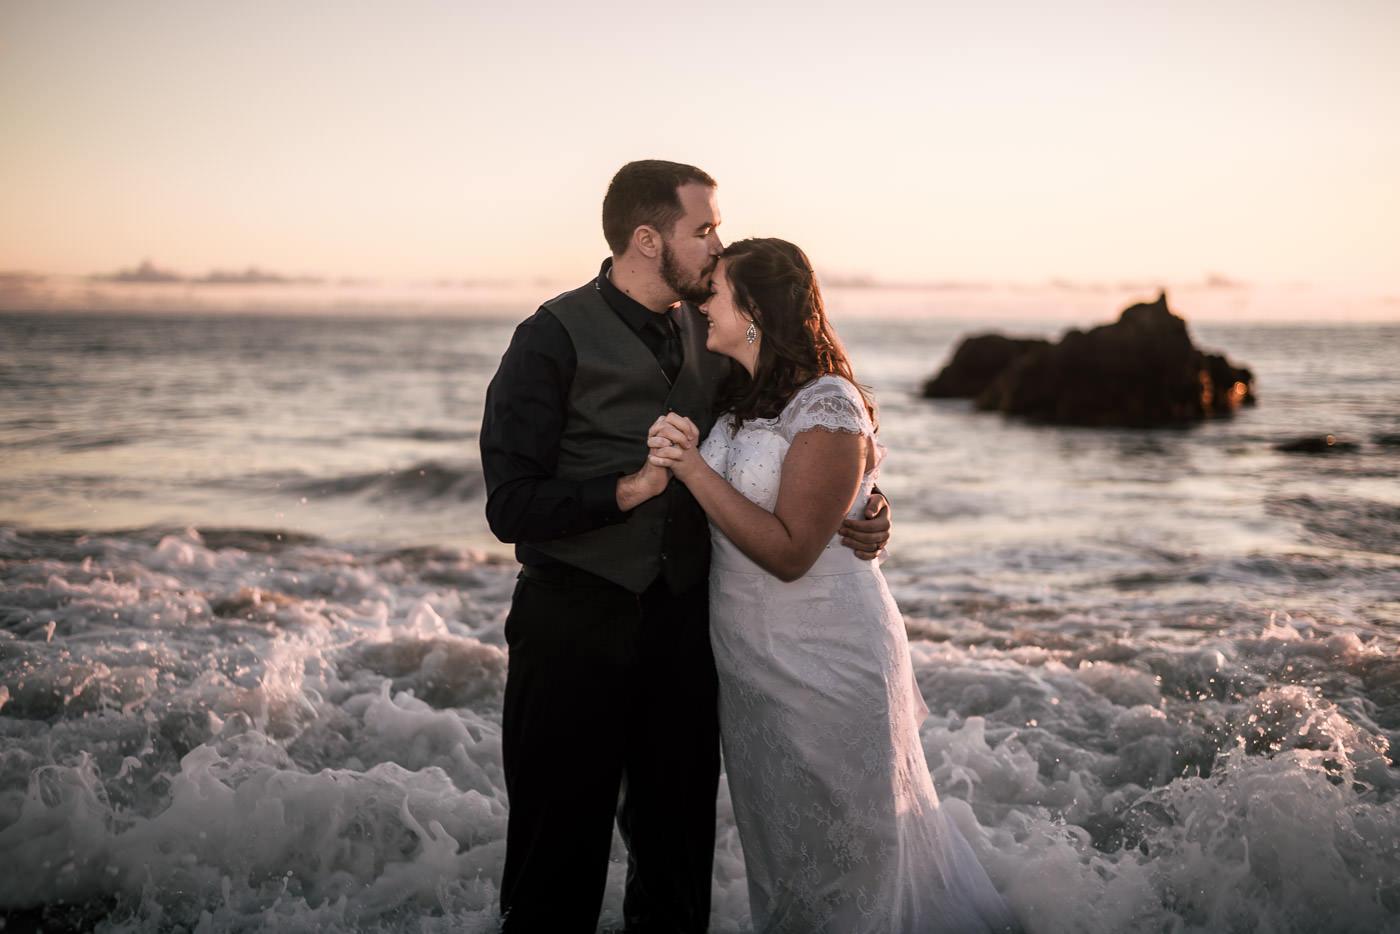 Romantic wedding photography in Laguna Beach.